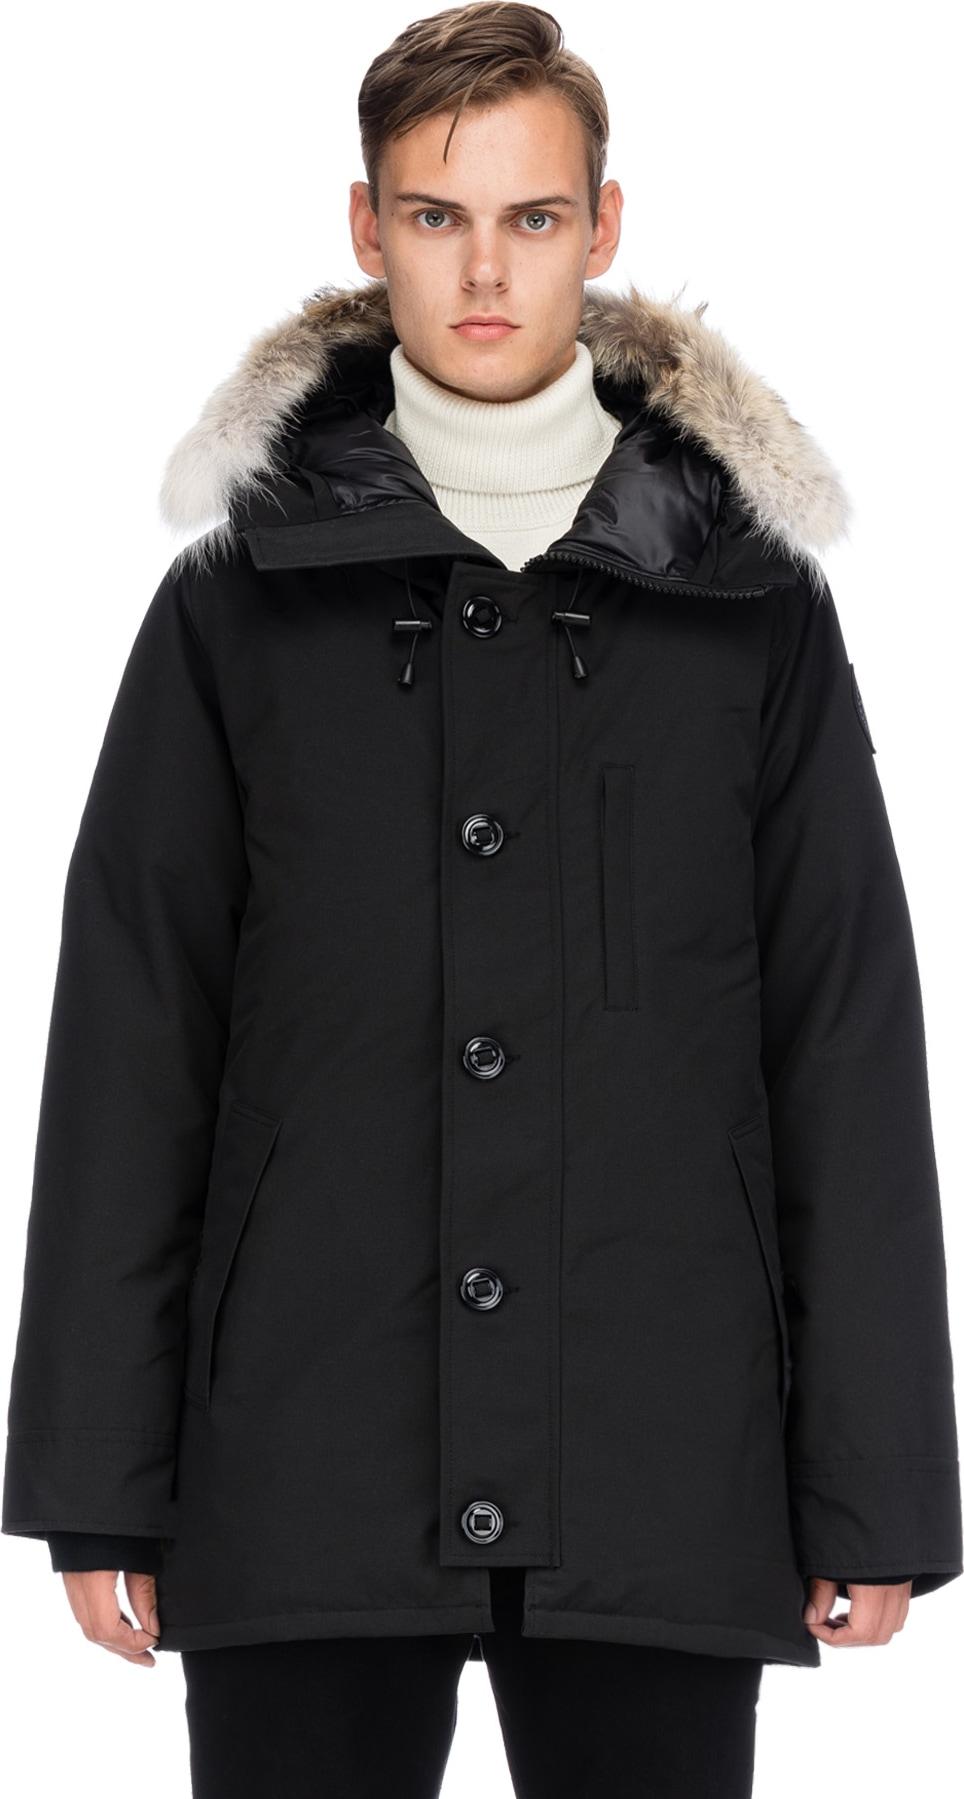 canada goose chateau parka black men's jackets